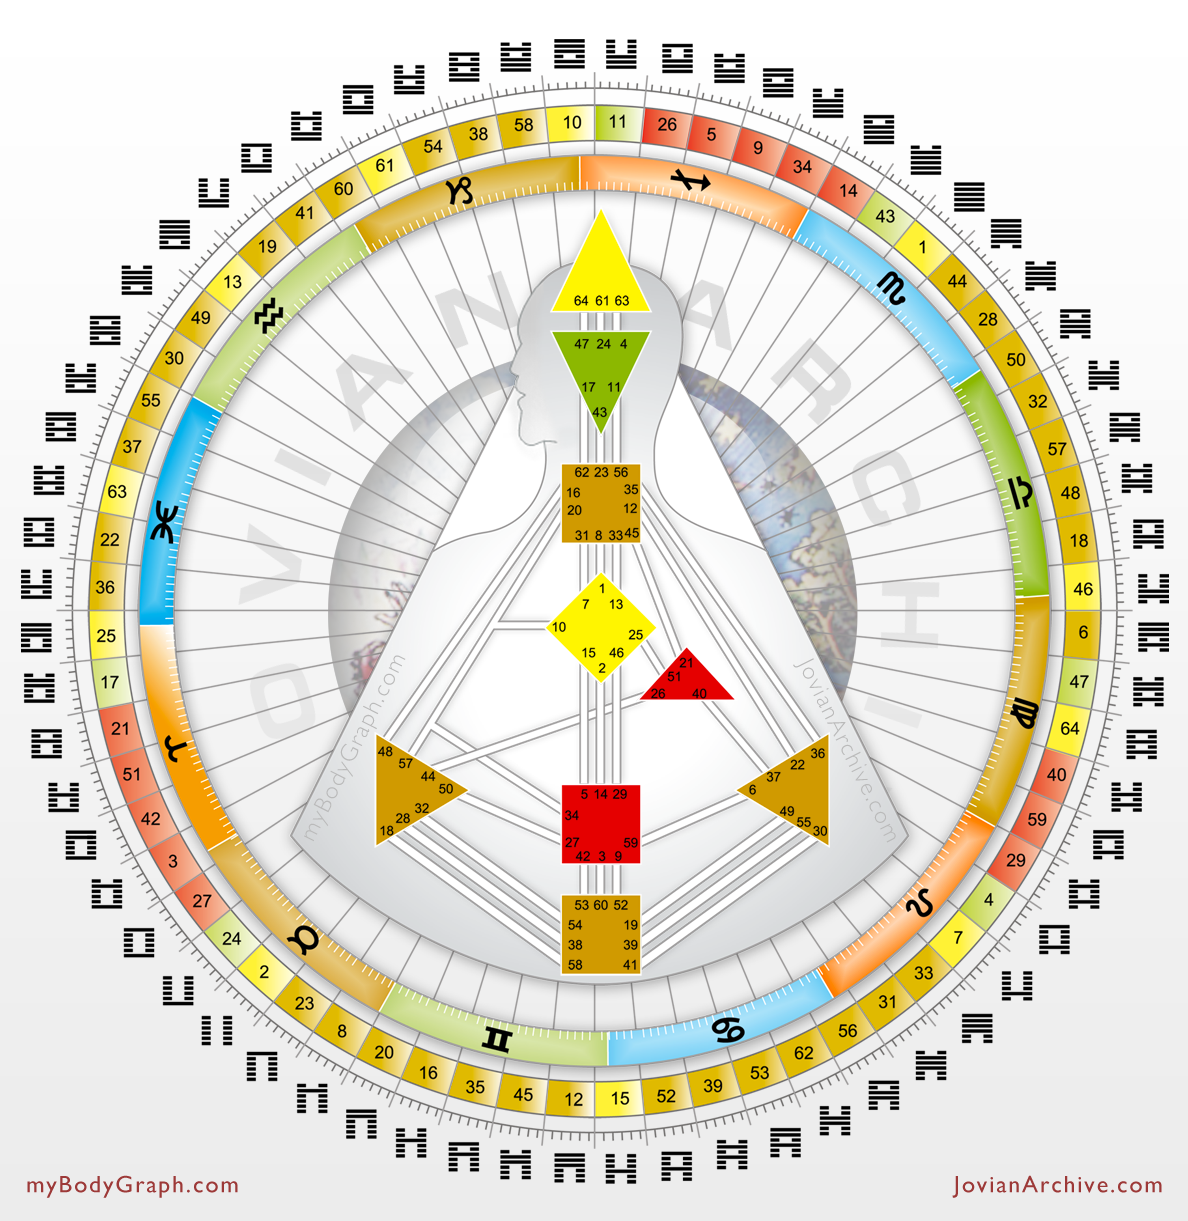 The Rave Mandala